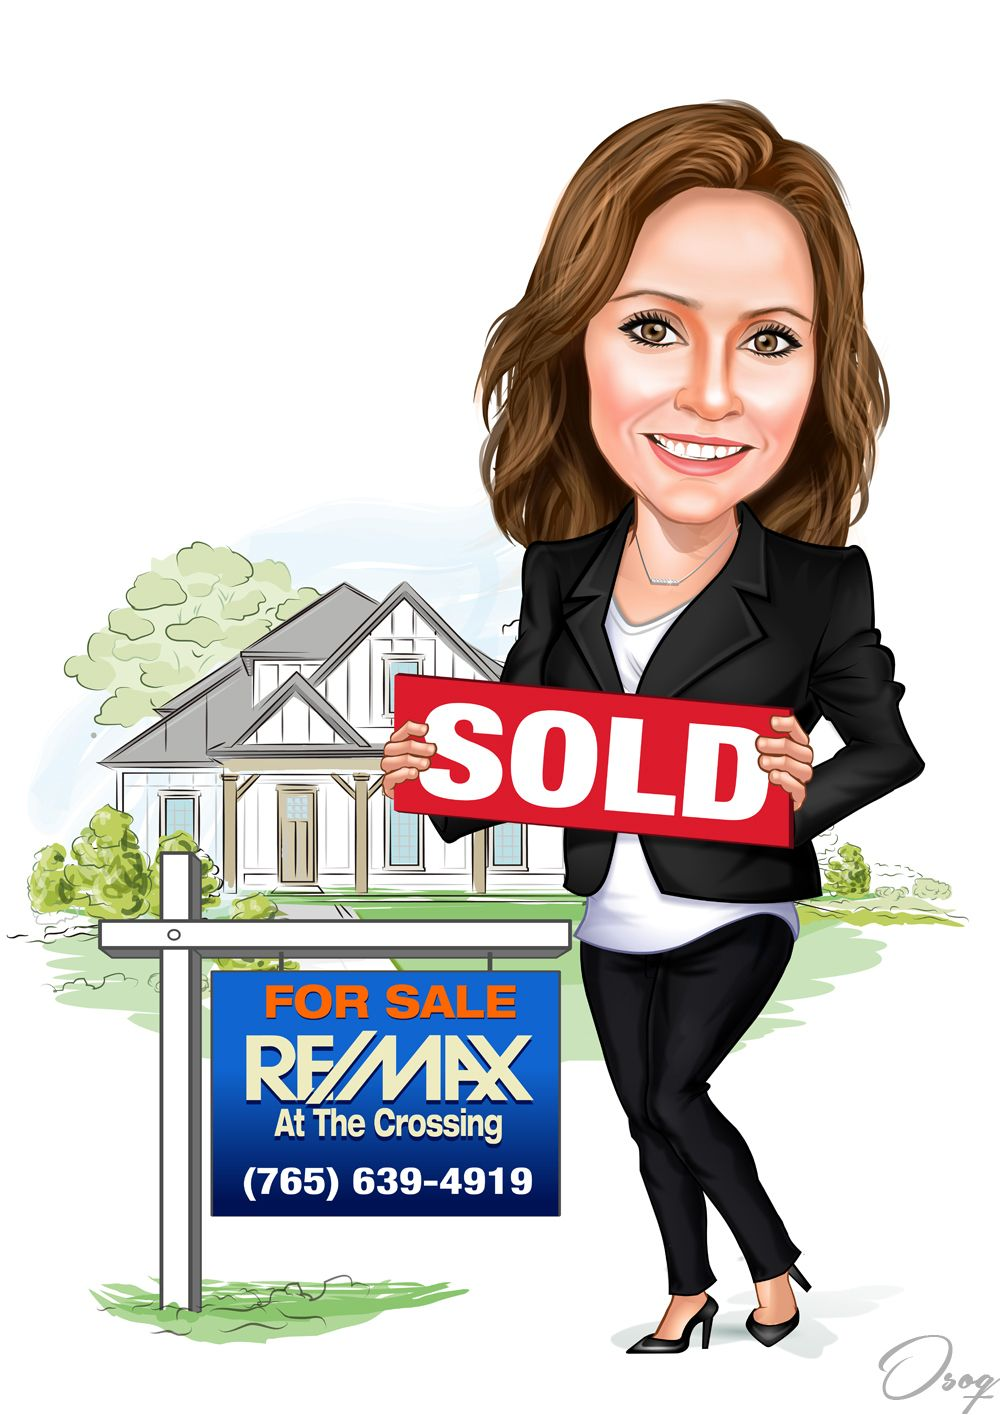 Cartoon House Sign Cartoon House Real Estate Ads Real Estate